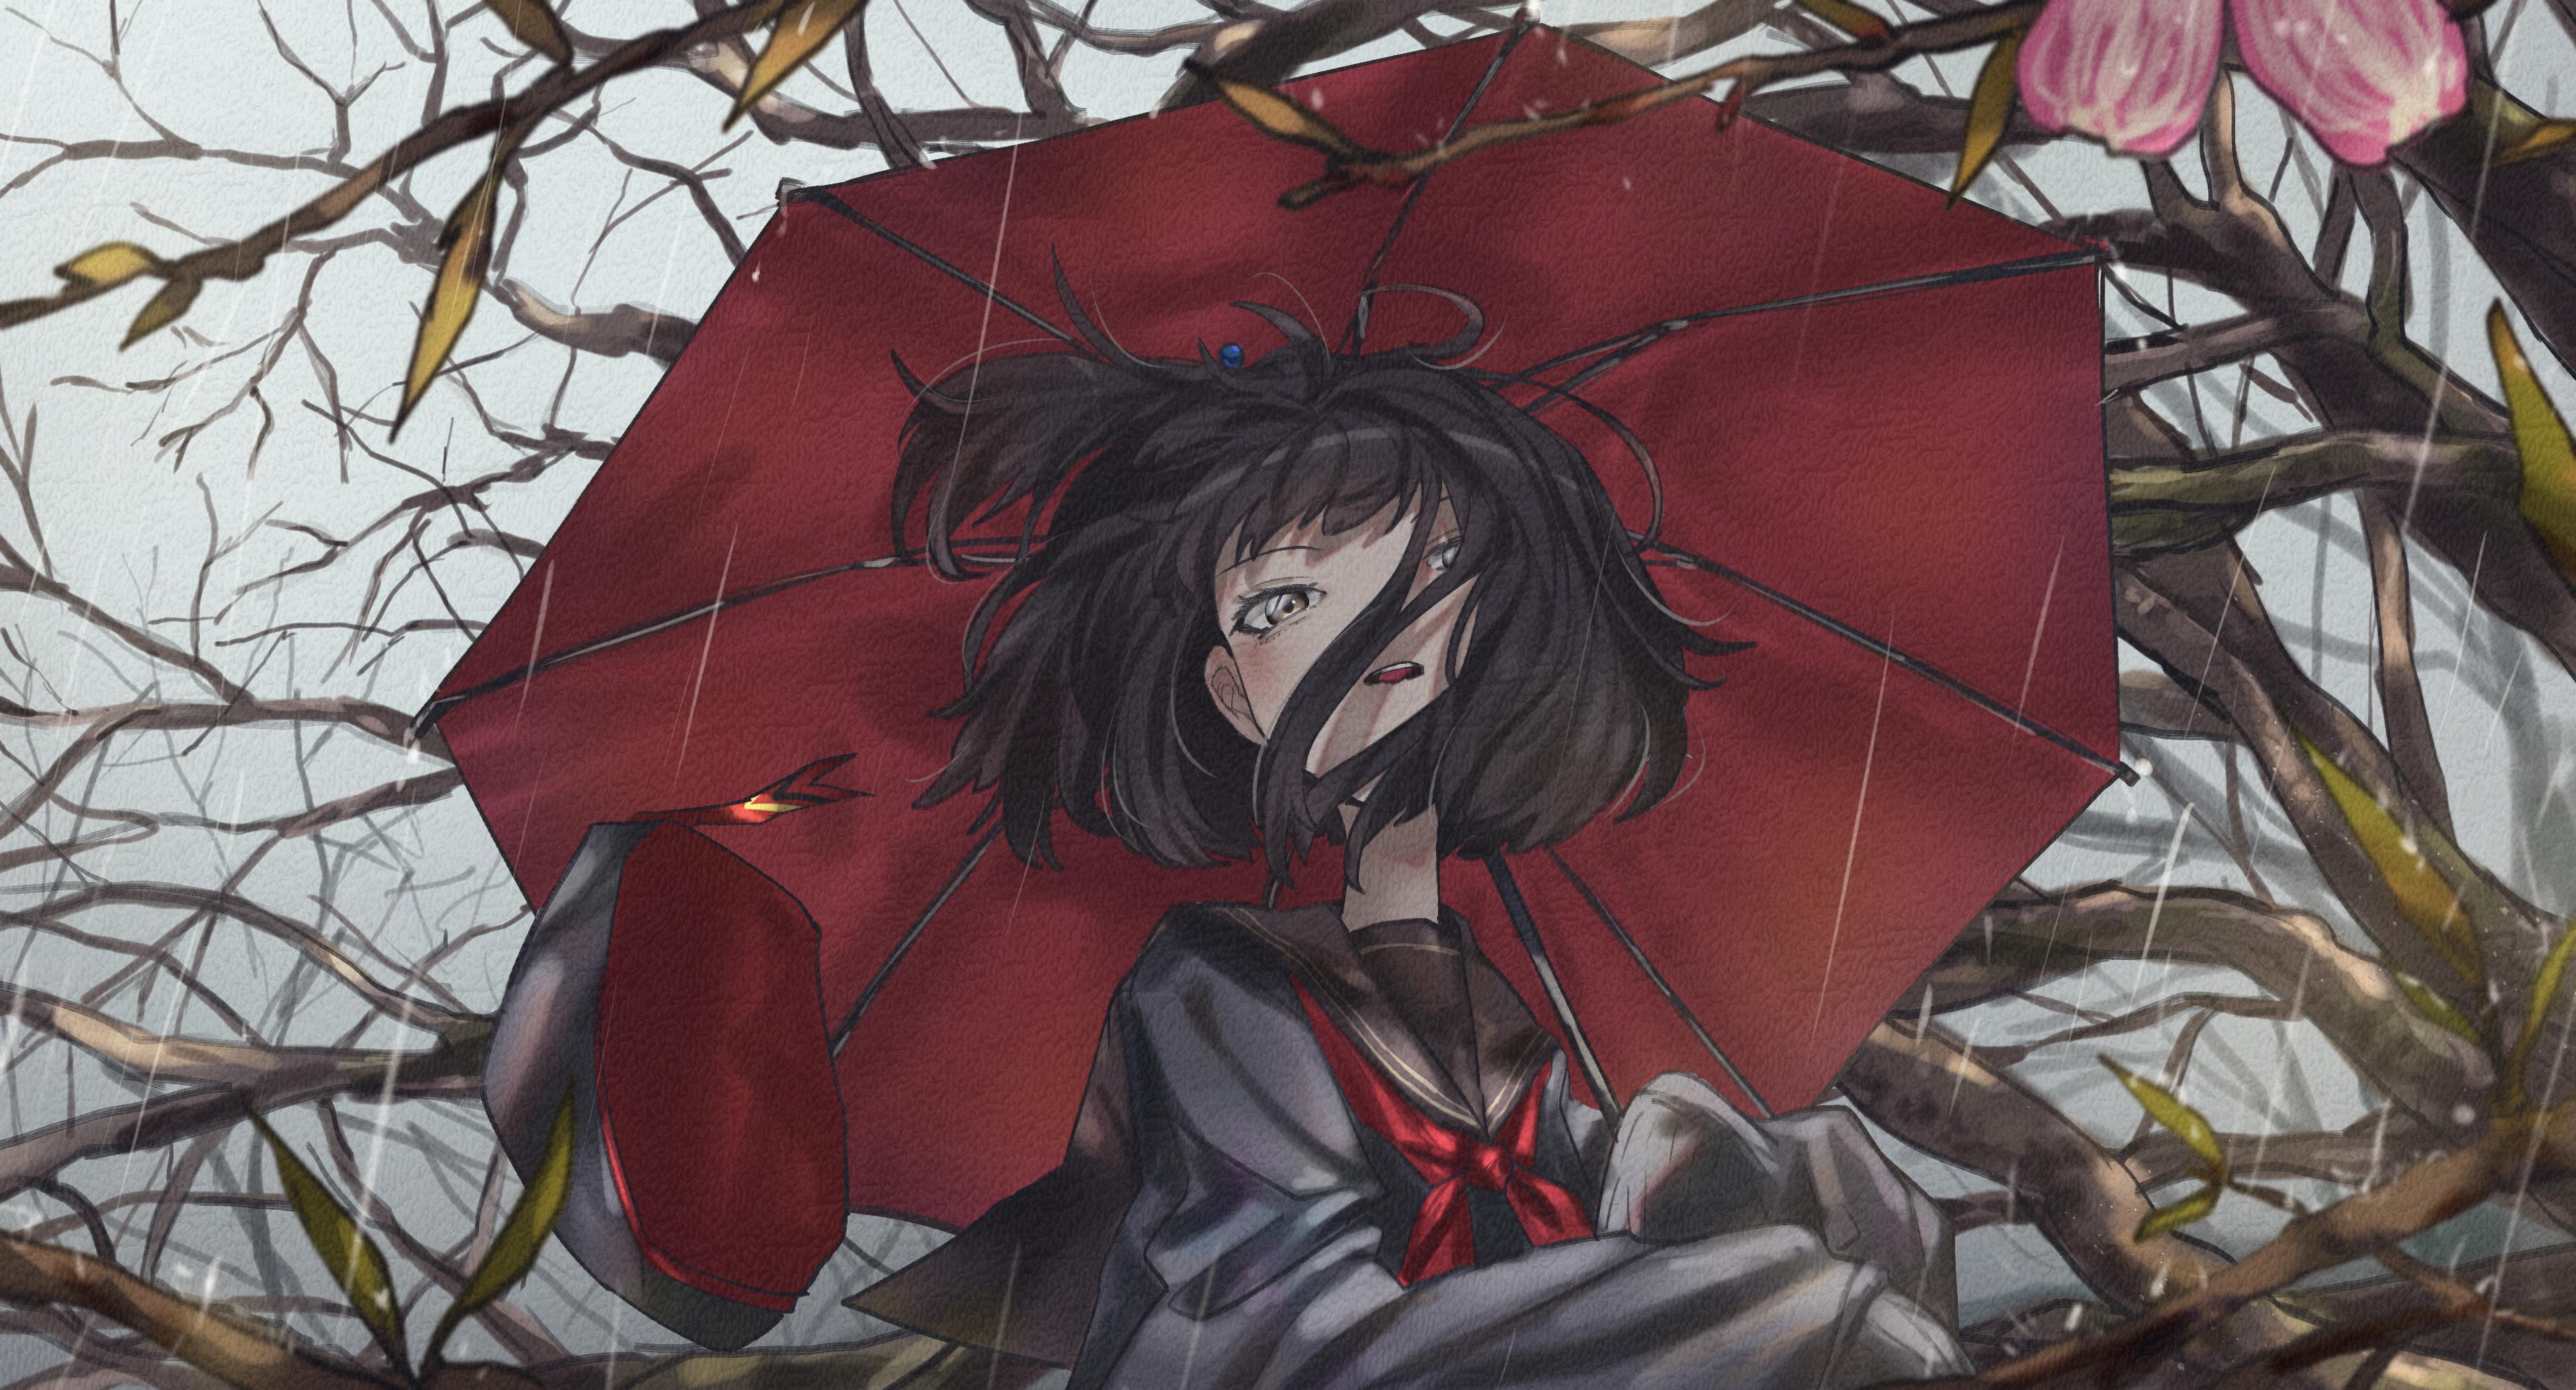 Anime 3833x2068 anime anime girls umbrella rain black hair short hair yellow eyes sailor uniform trees berets spring looking at viewer plants Virtual Youtuber Amemori Sayo M0chi0000